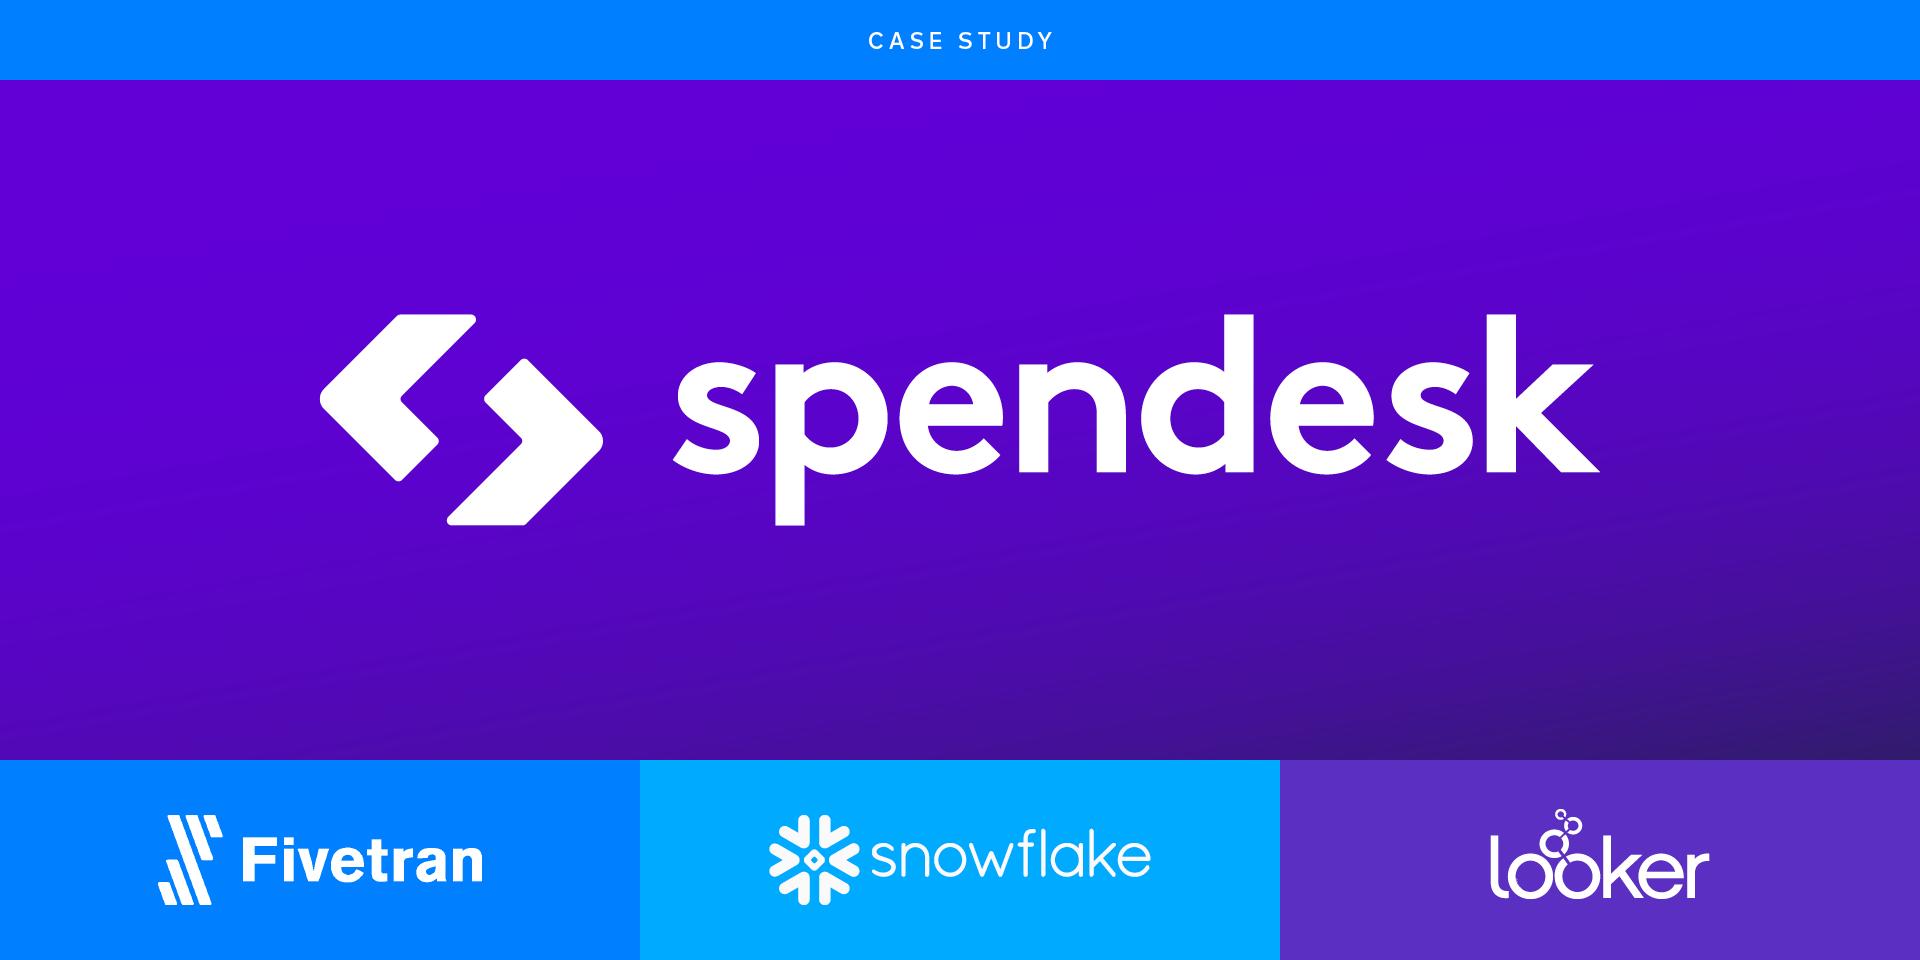 Spendesk Spends Time on Analysis, Not ELT